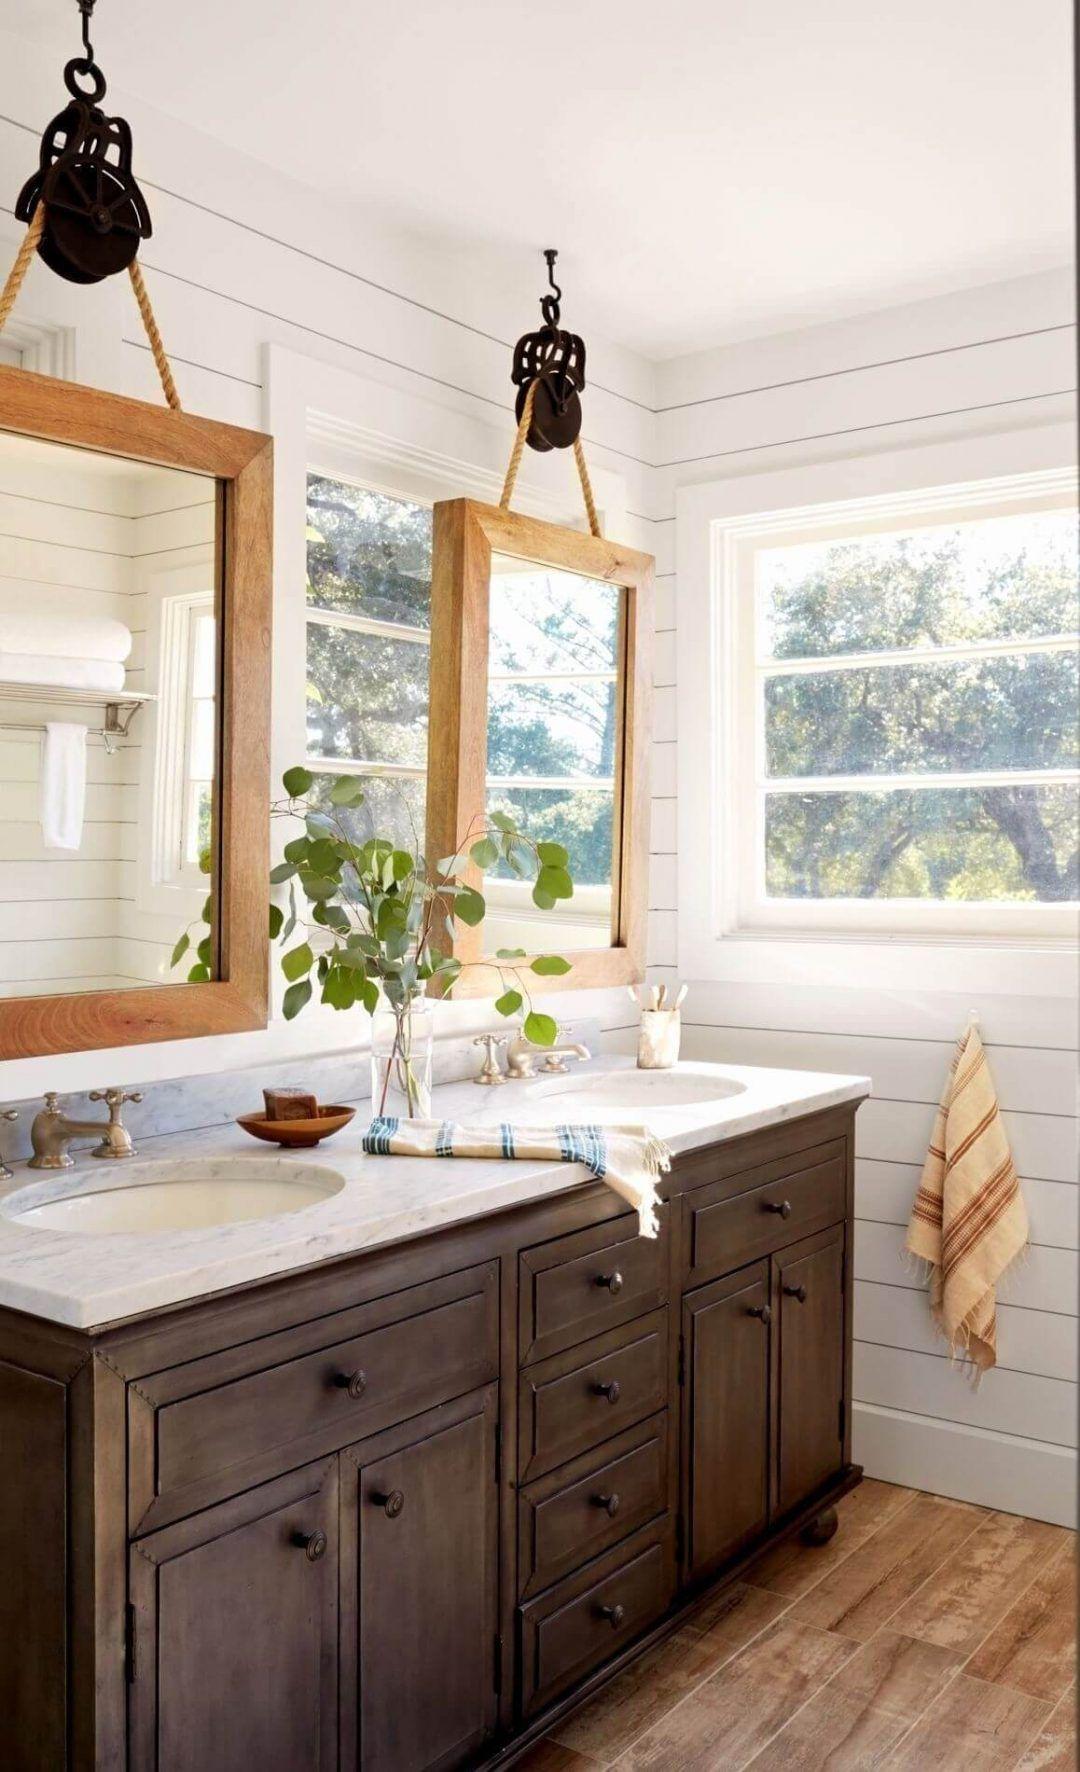 25 Stunning Shabby Chic Bathroom Designs That Will Adore You - Ff5Ec3F6Dd5E7B1D4A2D0450Cdde9C0E